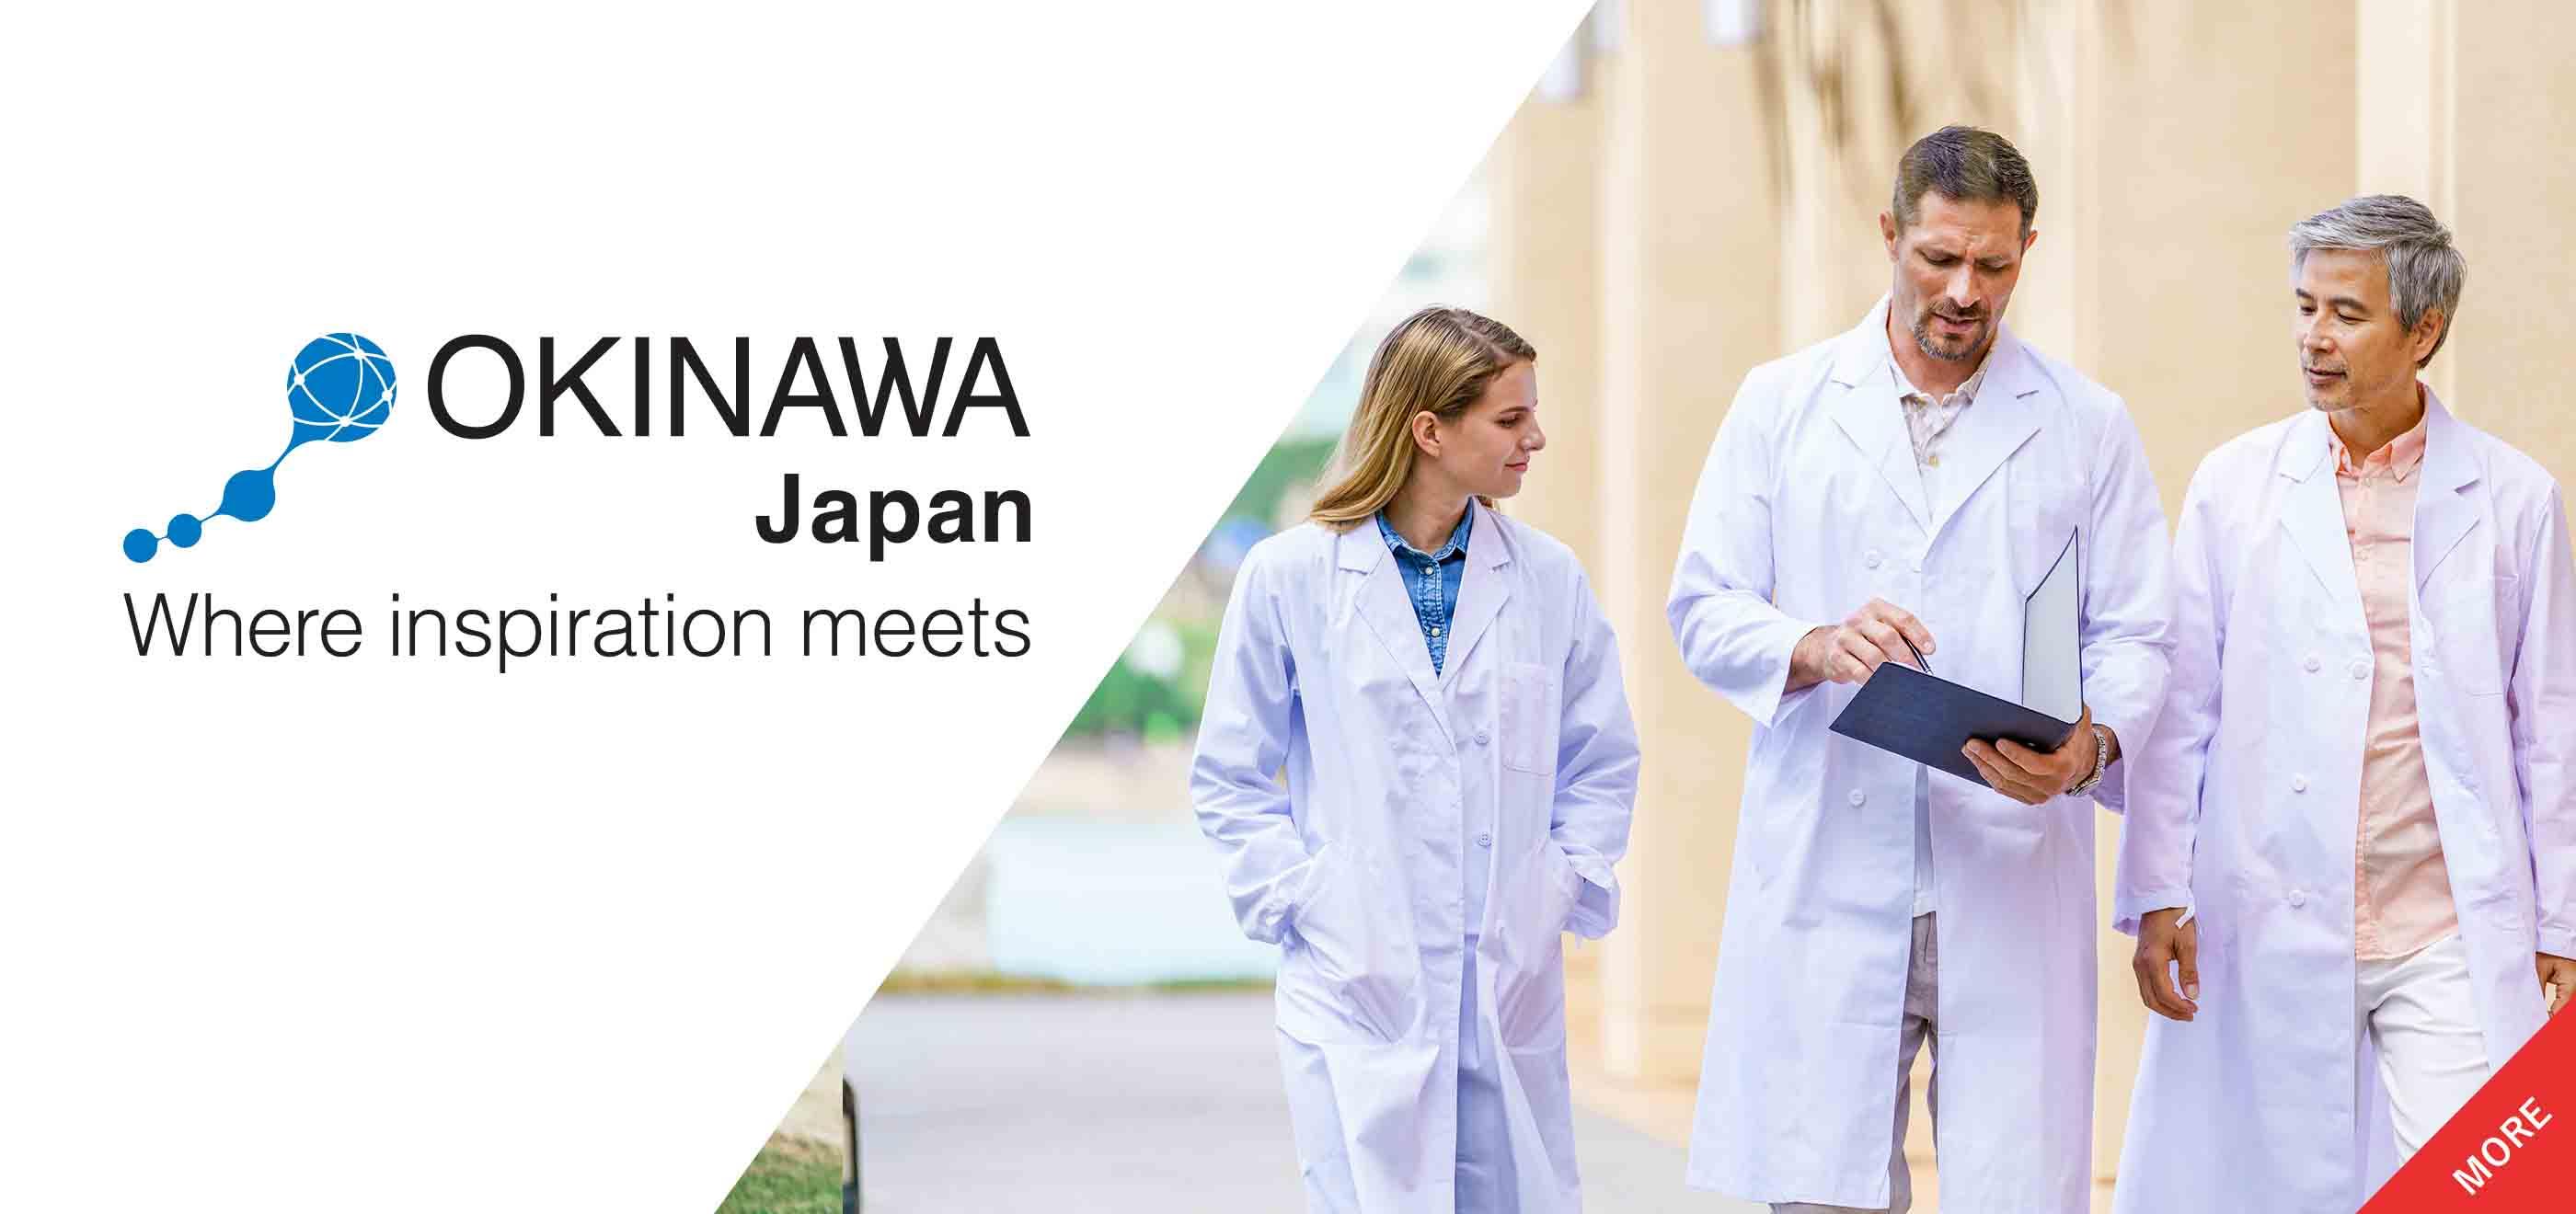 OKINAWA Japan Where inspiration meets